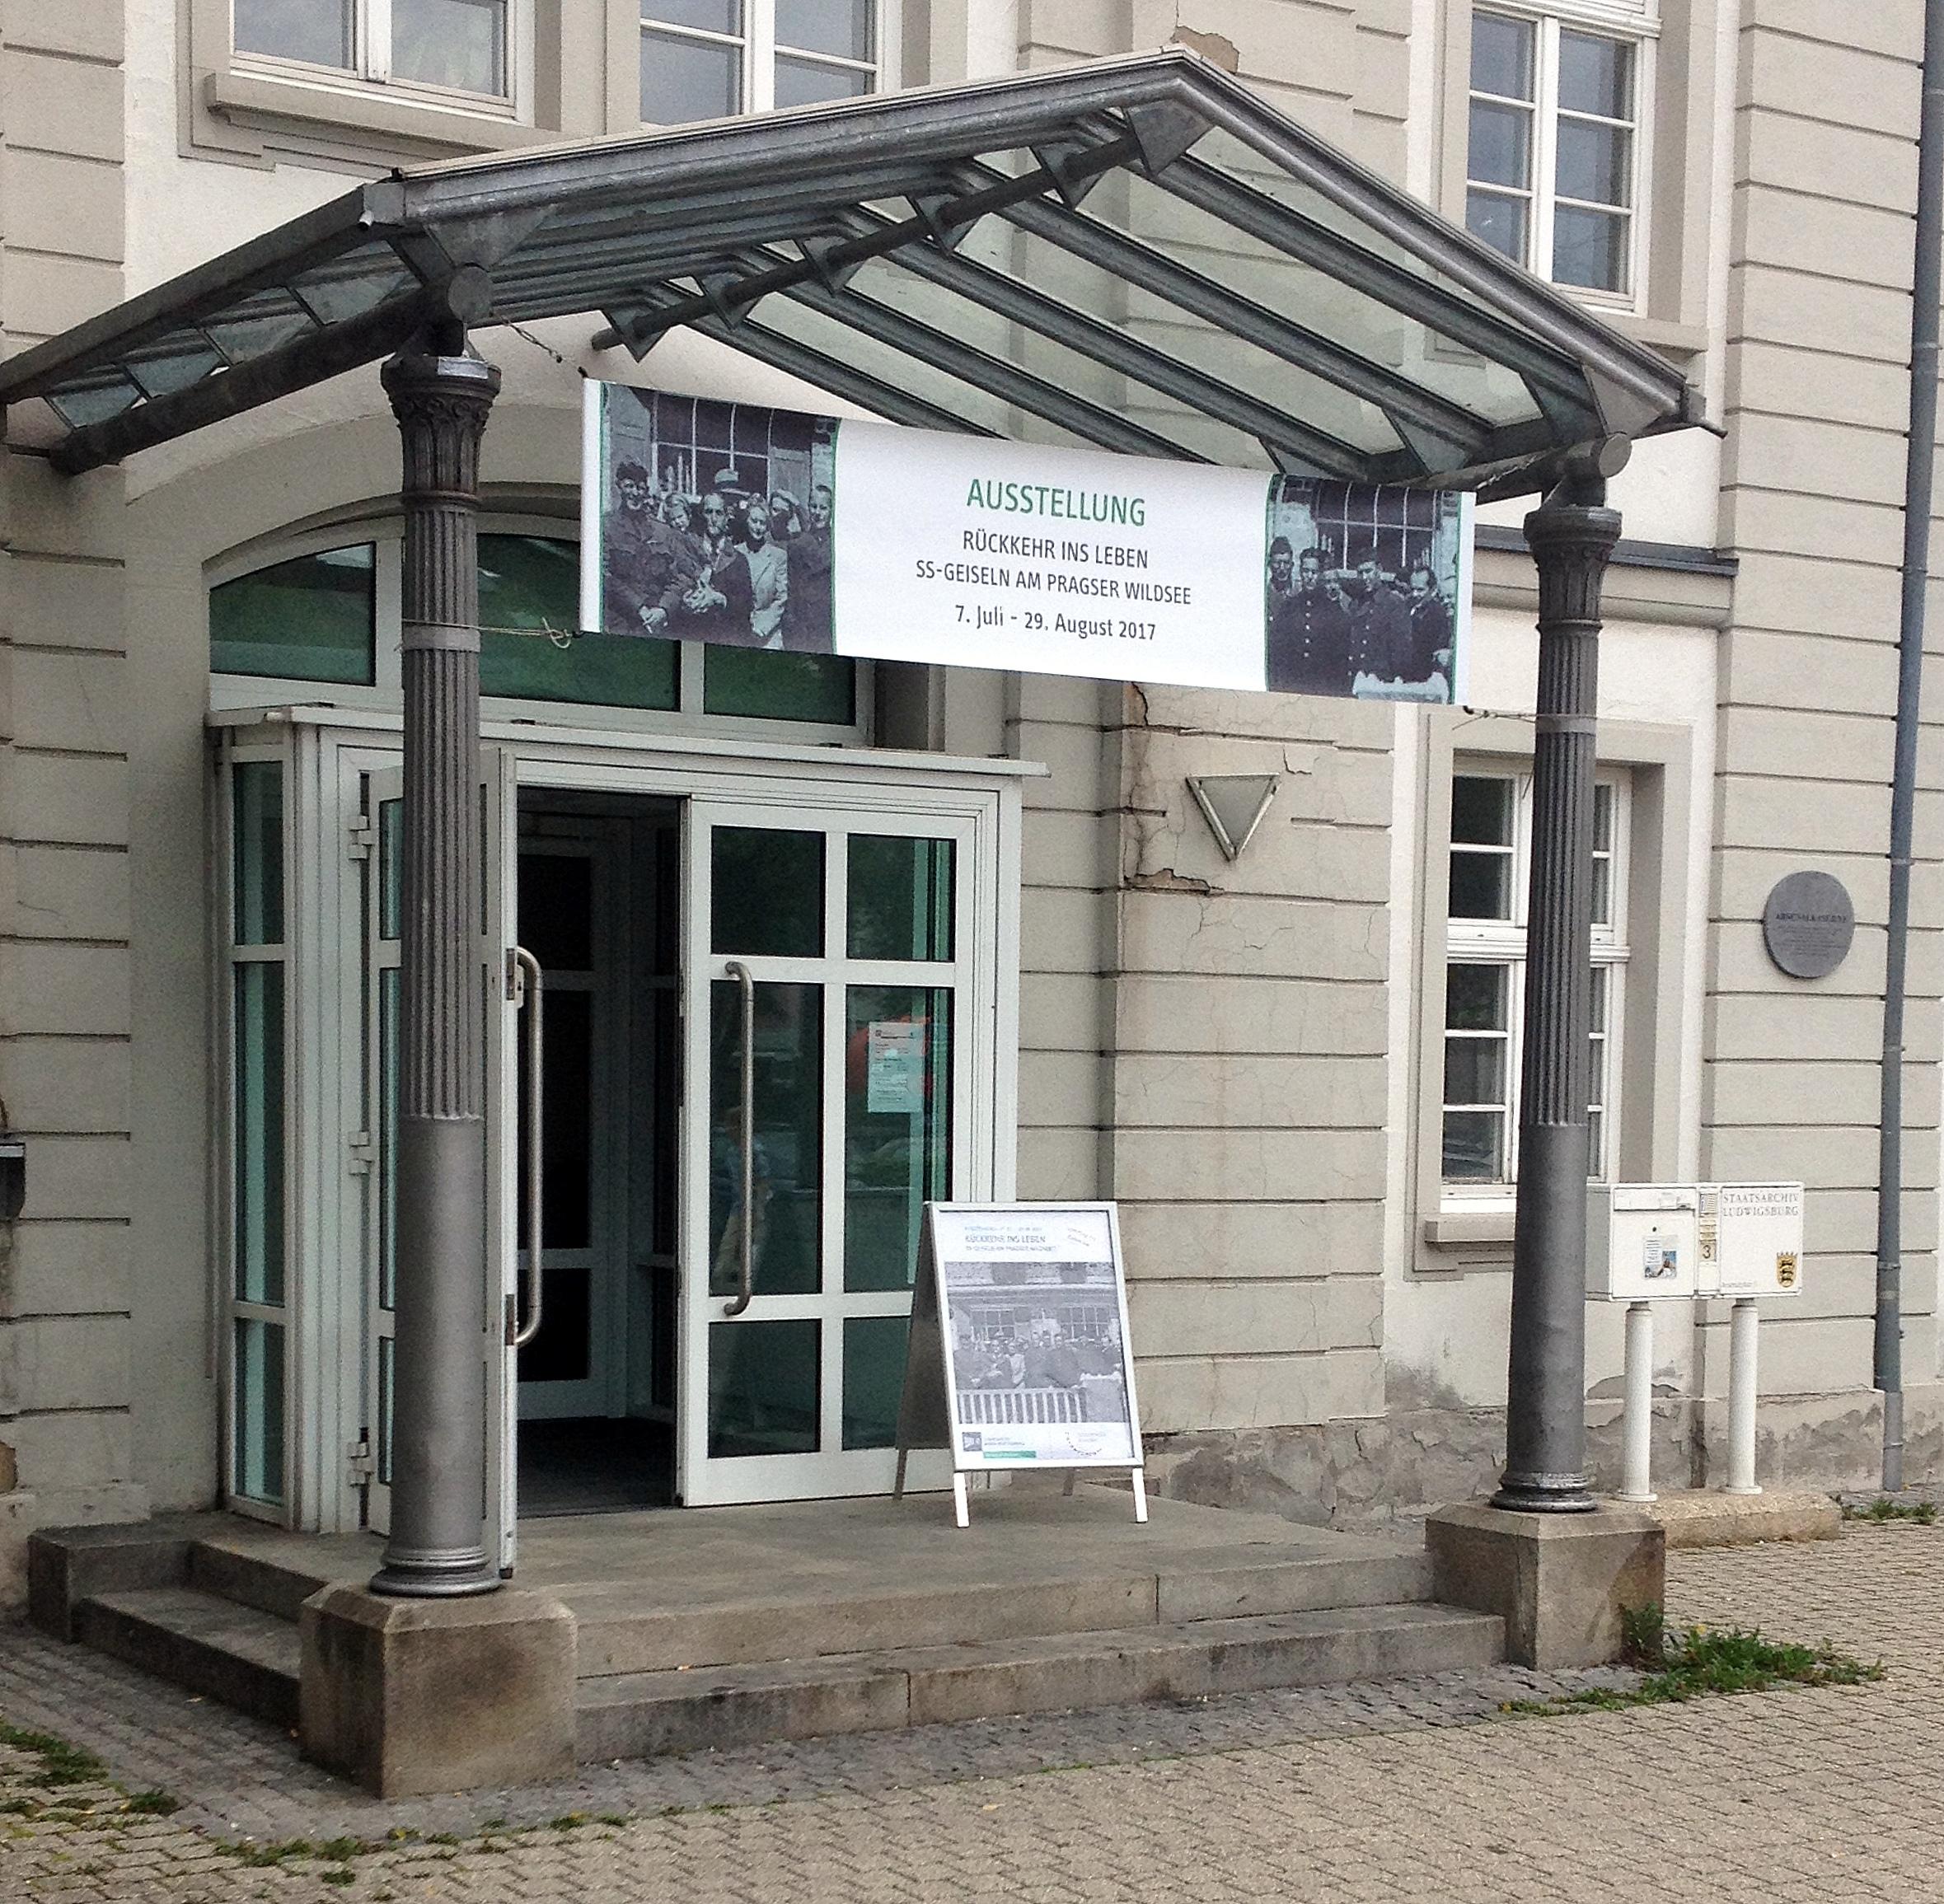 Ludwigsburg, Ausstellung 2017